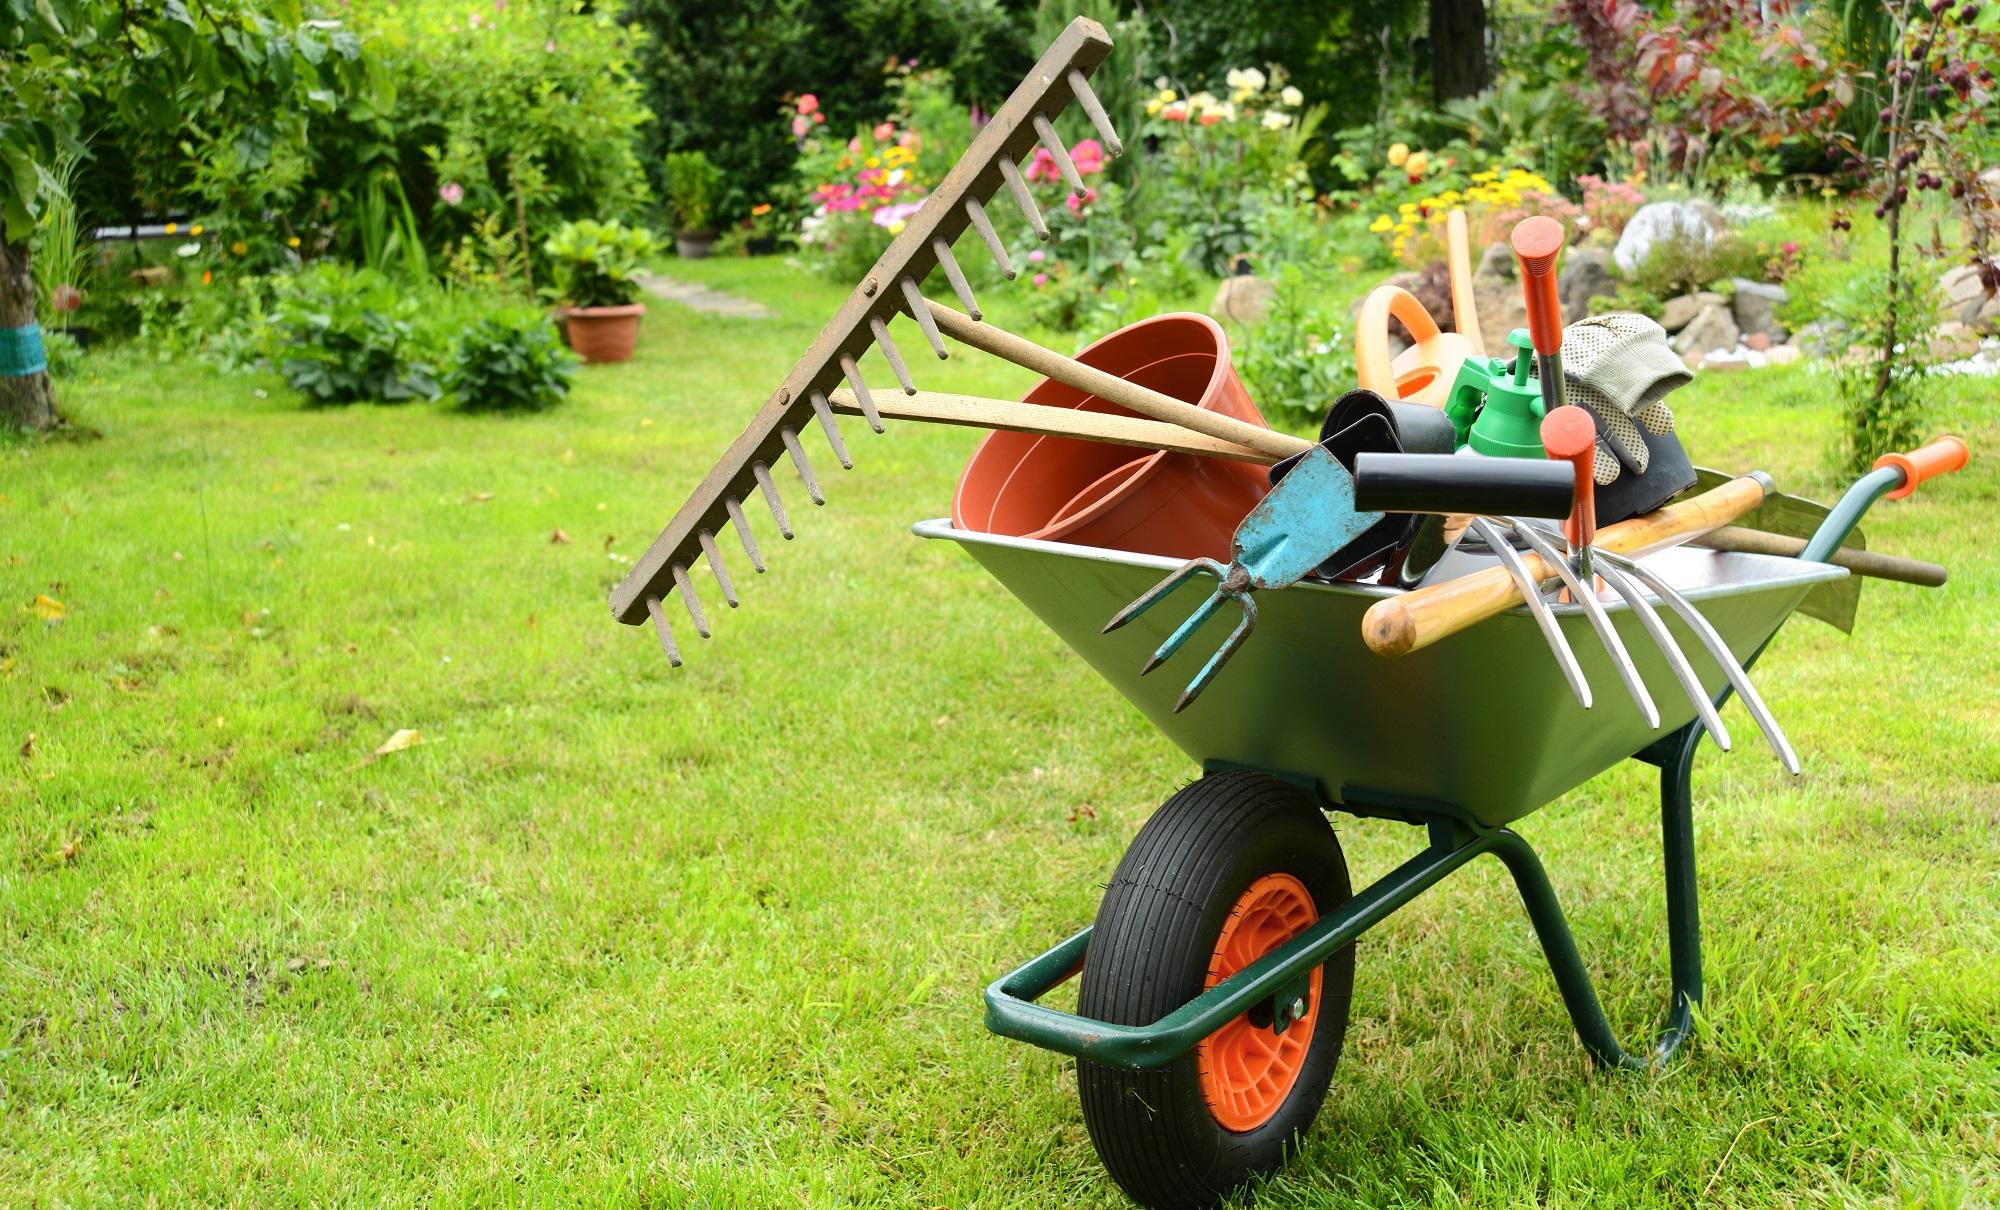 Landscaping-Tools.jpg